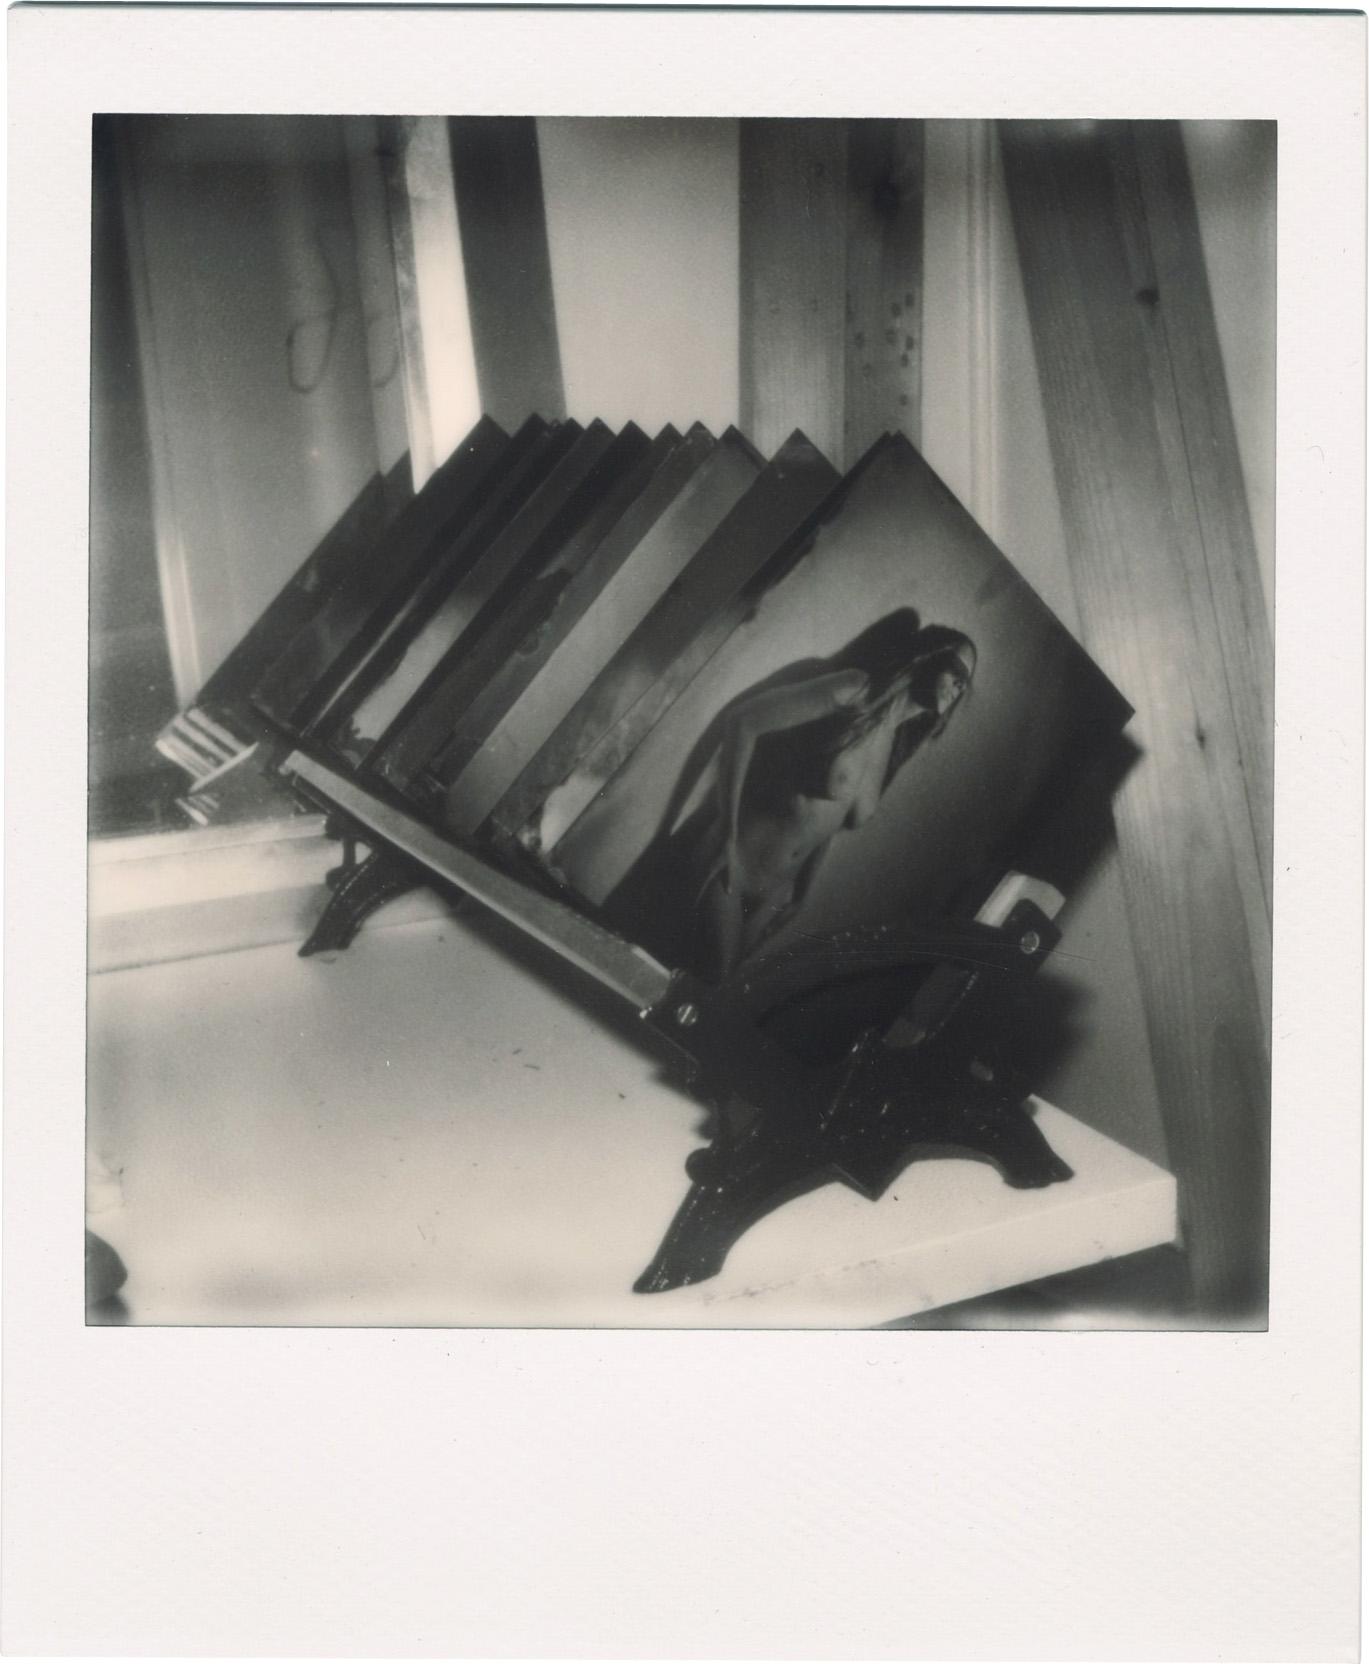 The plate rack. Black and white Polaroid.